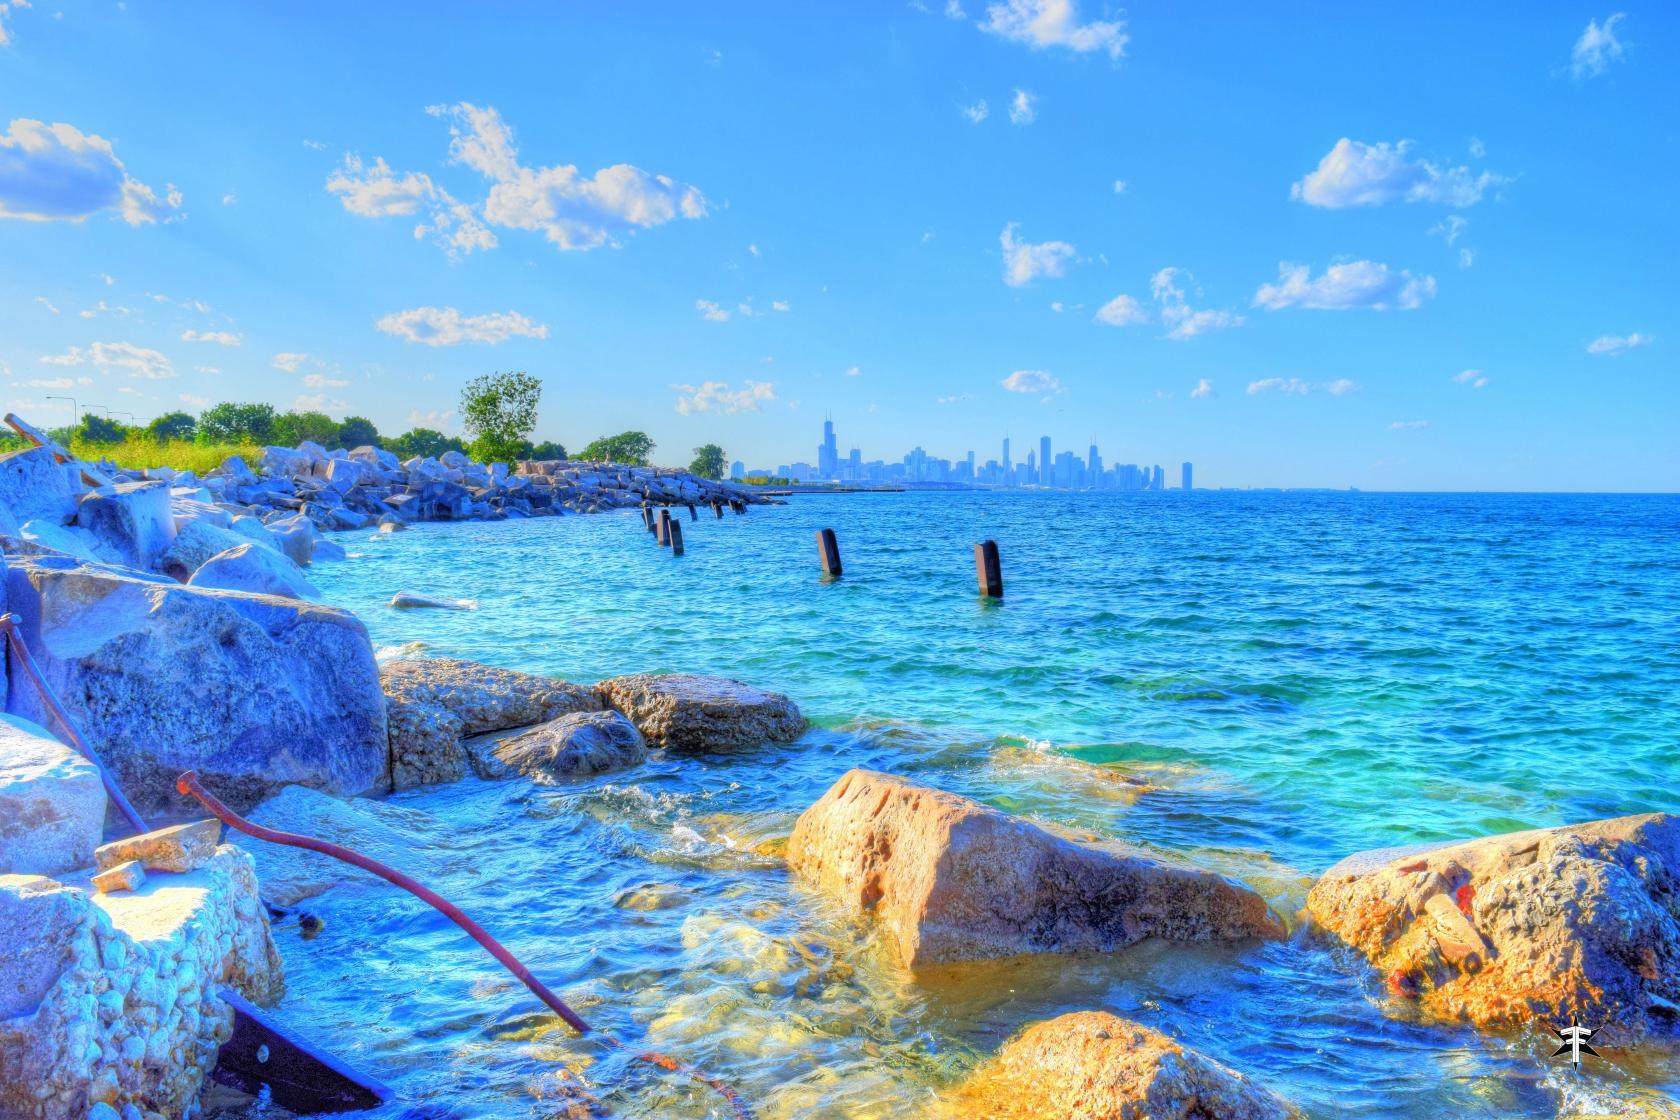 batch_chicago lake michigan skyline water colorful industrial rocks.jpg